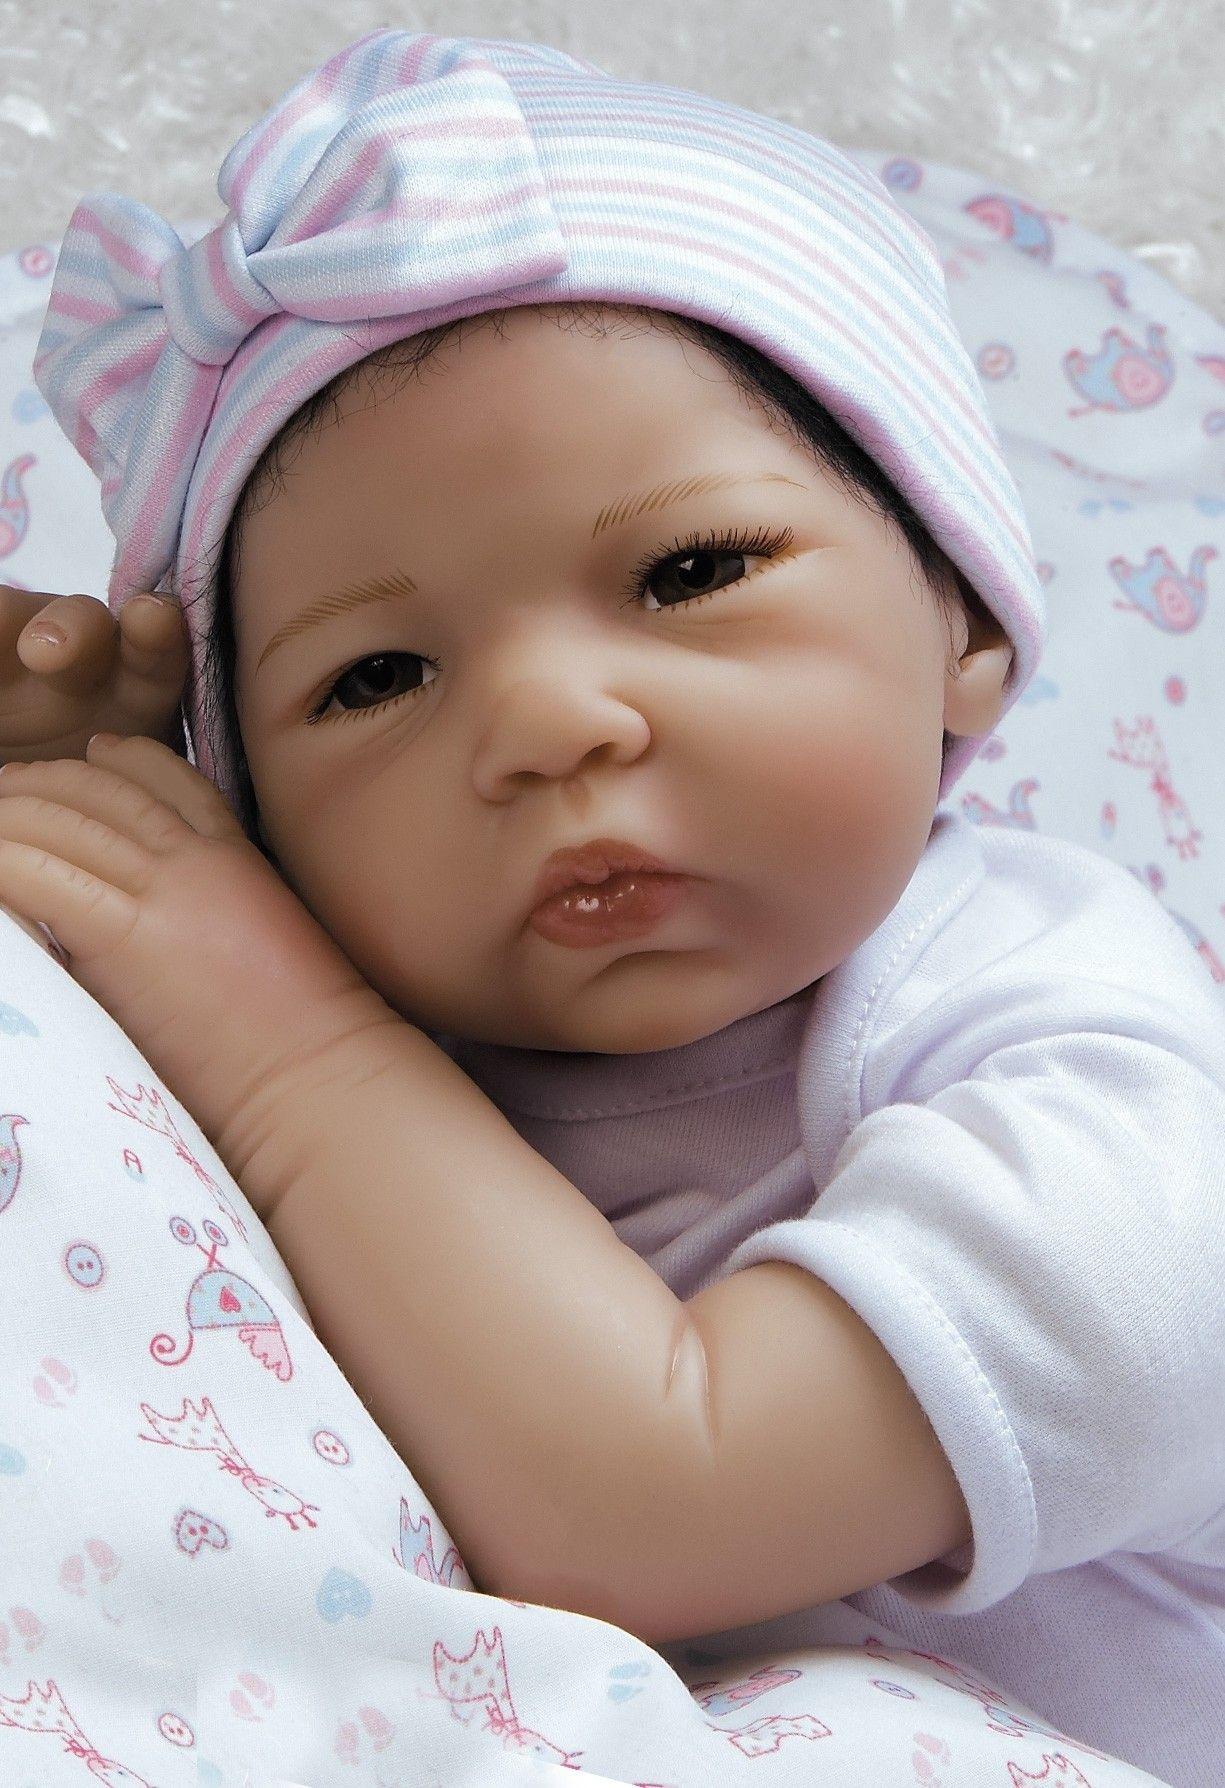 Realistic Asian Newborn Baby Doll Silicone Vinyl Baby